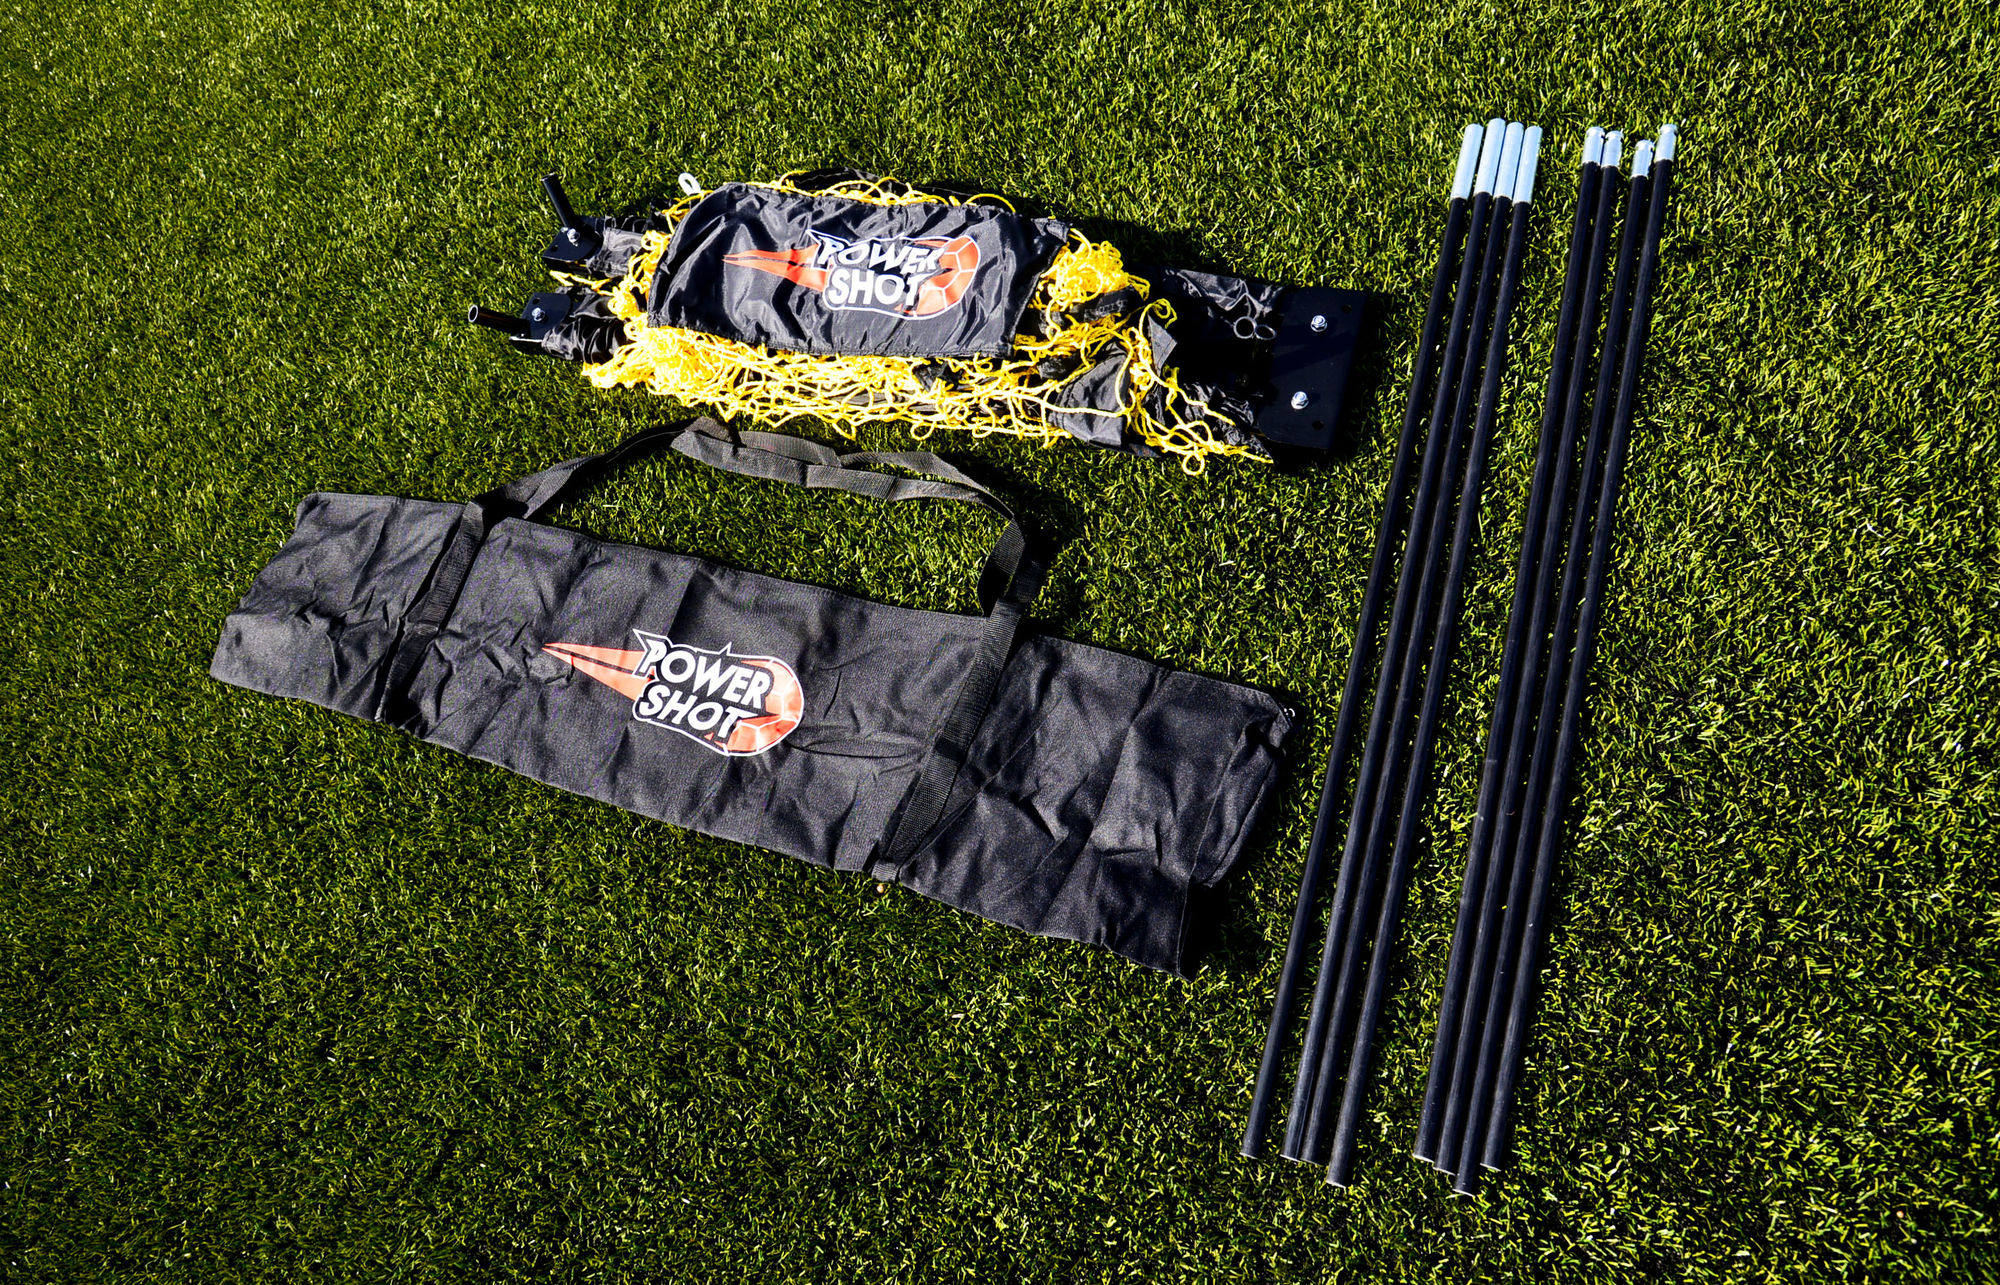 powershot lynxsport